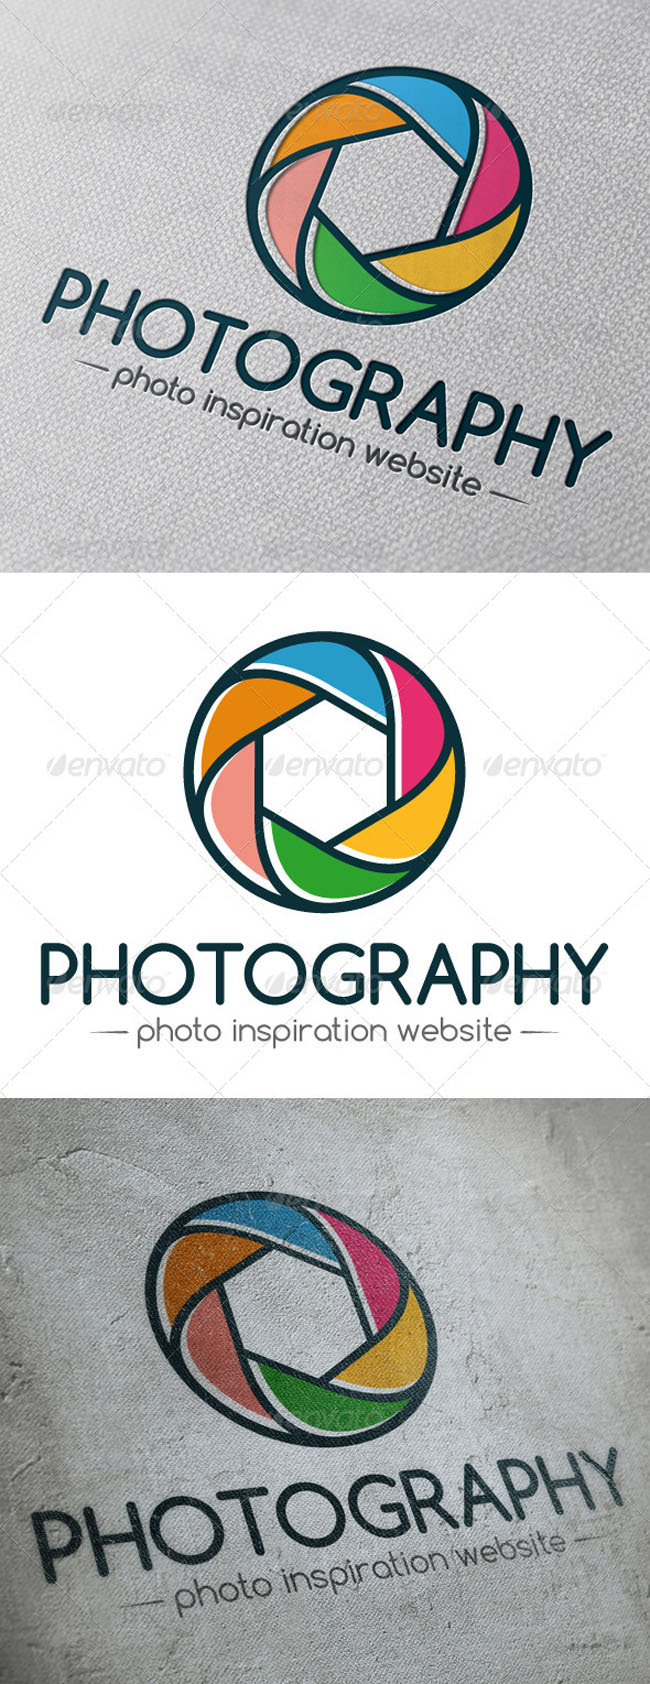 5 Photography Logo Design Templates Images